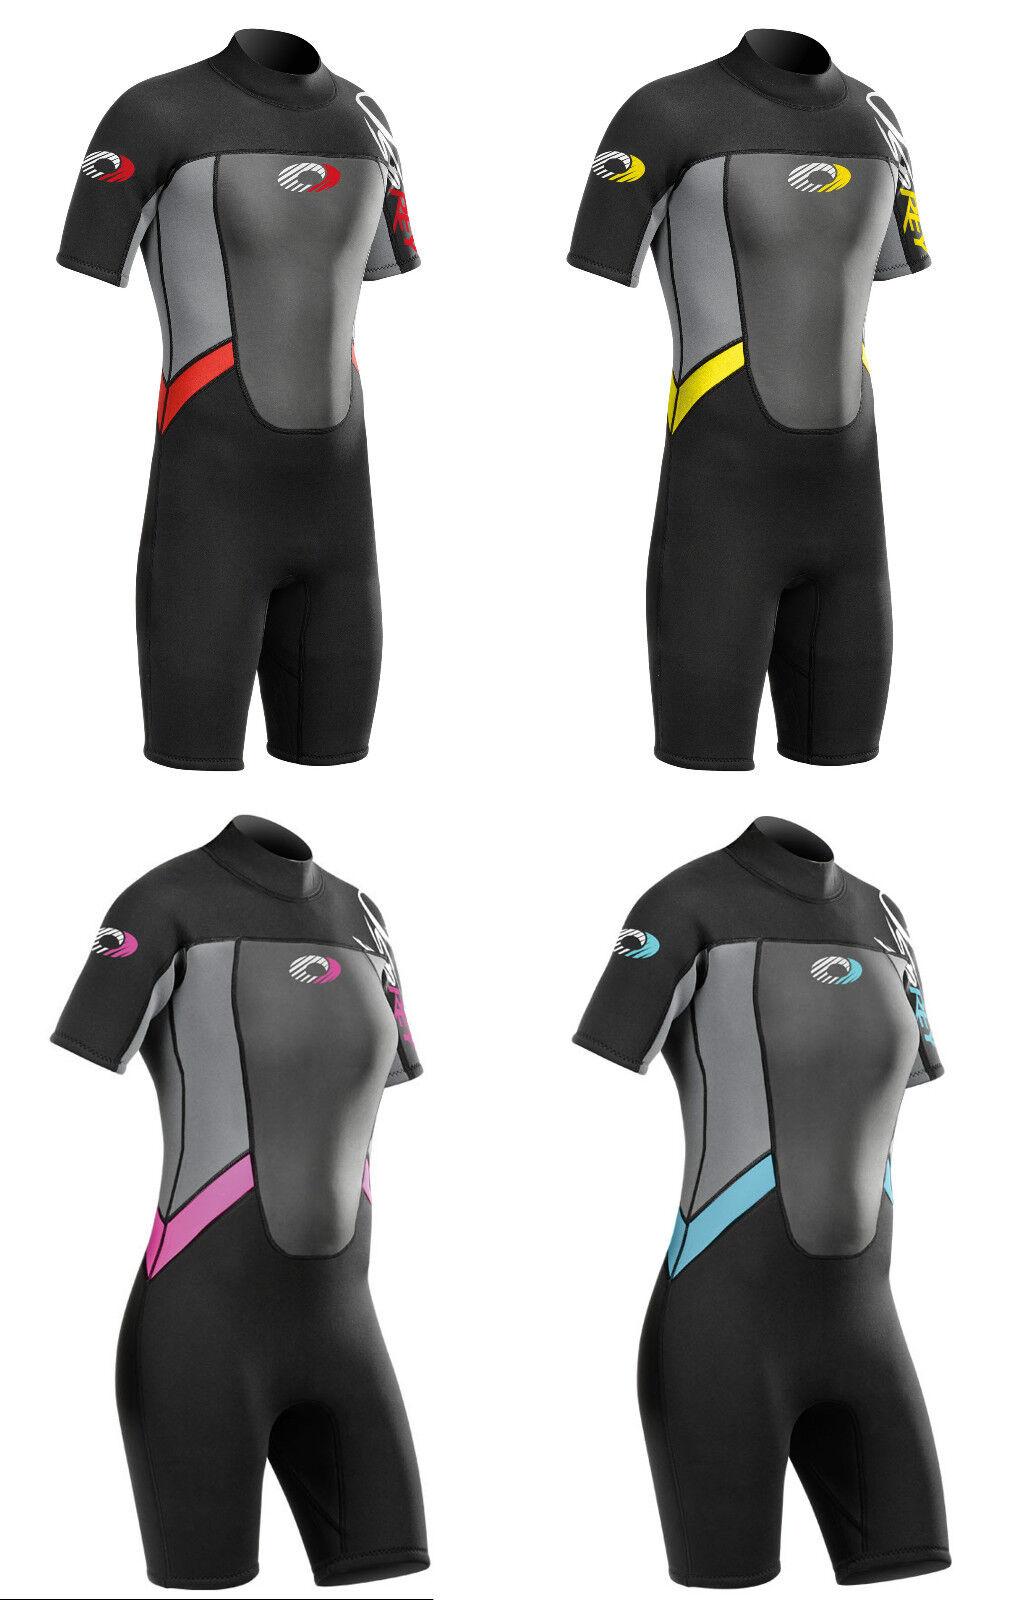 lds   Kids   Boys    Girls Osprey Origin 3 2mm Shorty   Short Sleeve Wetsuit  just for you